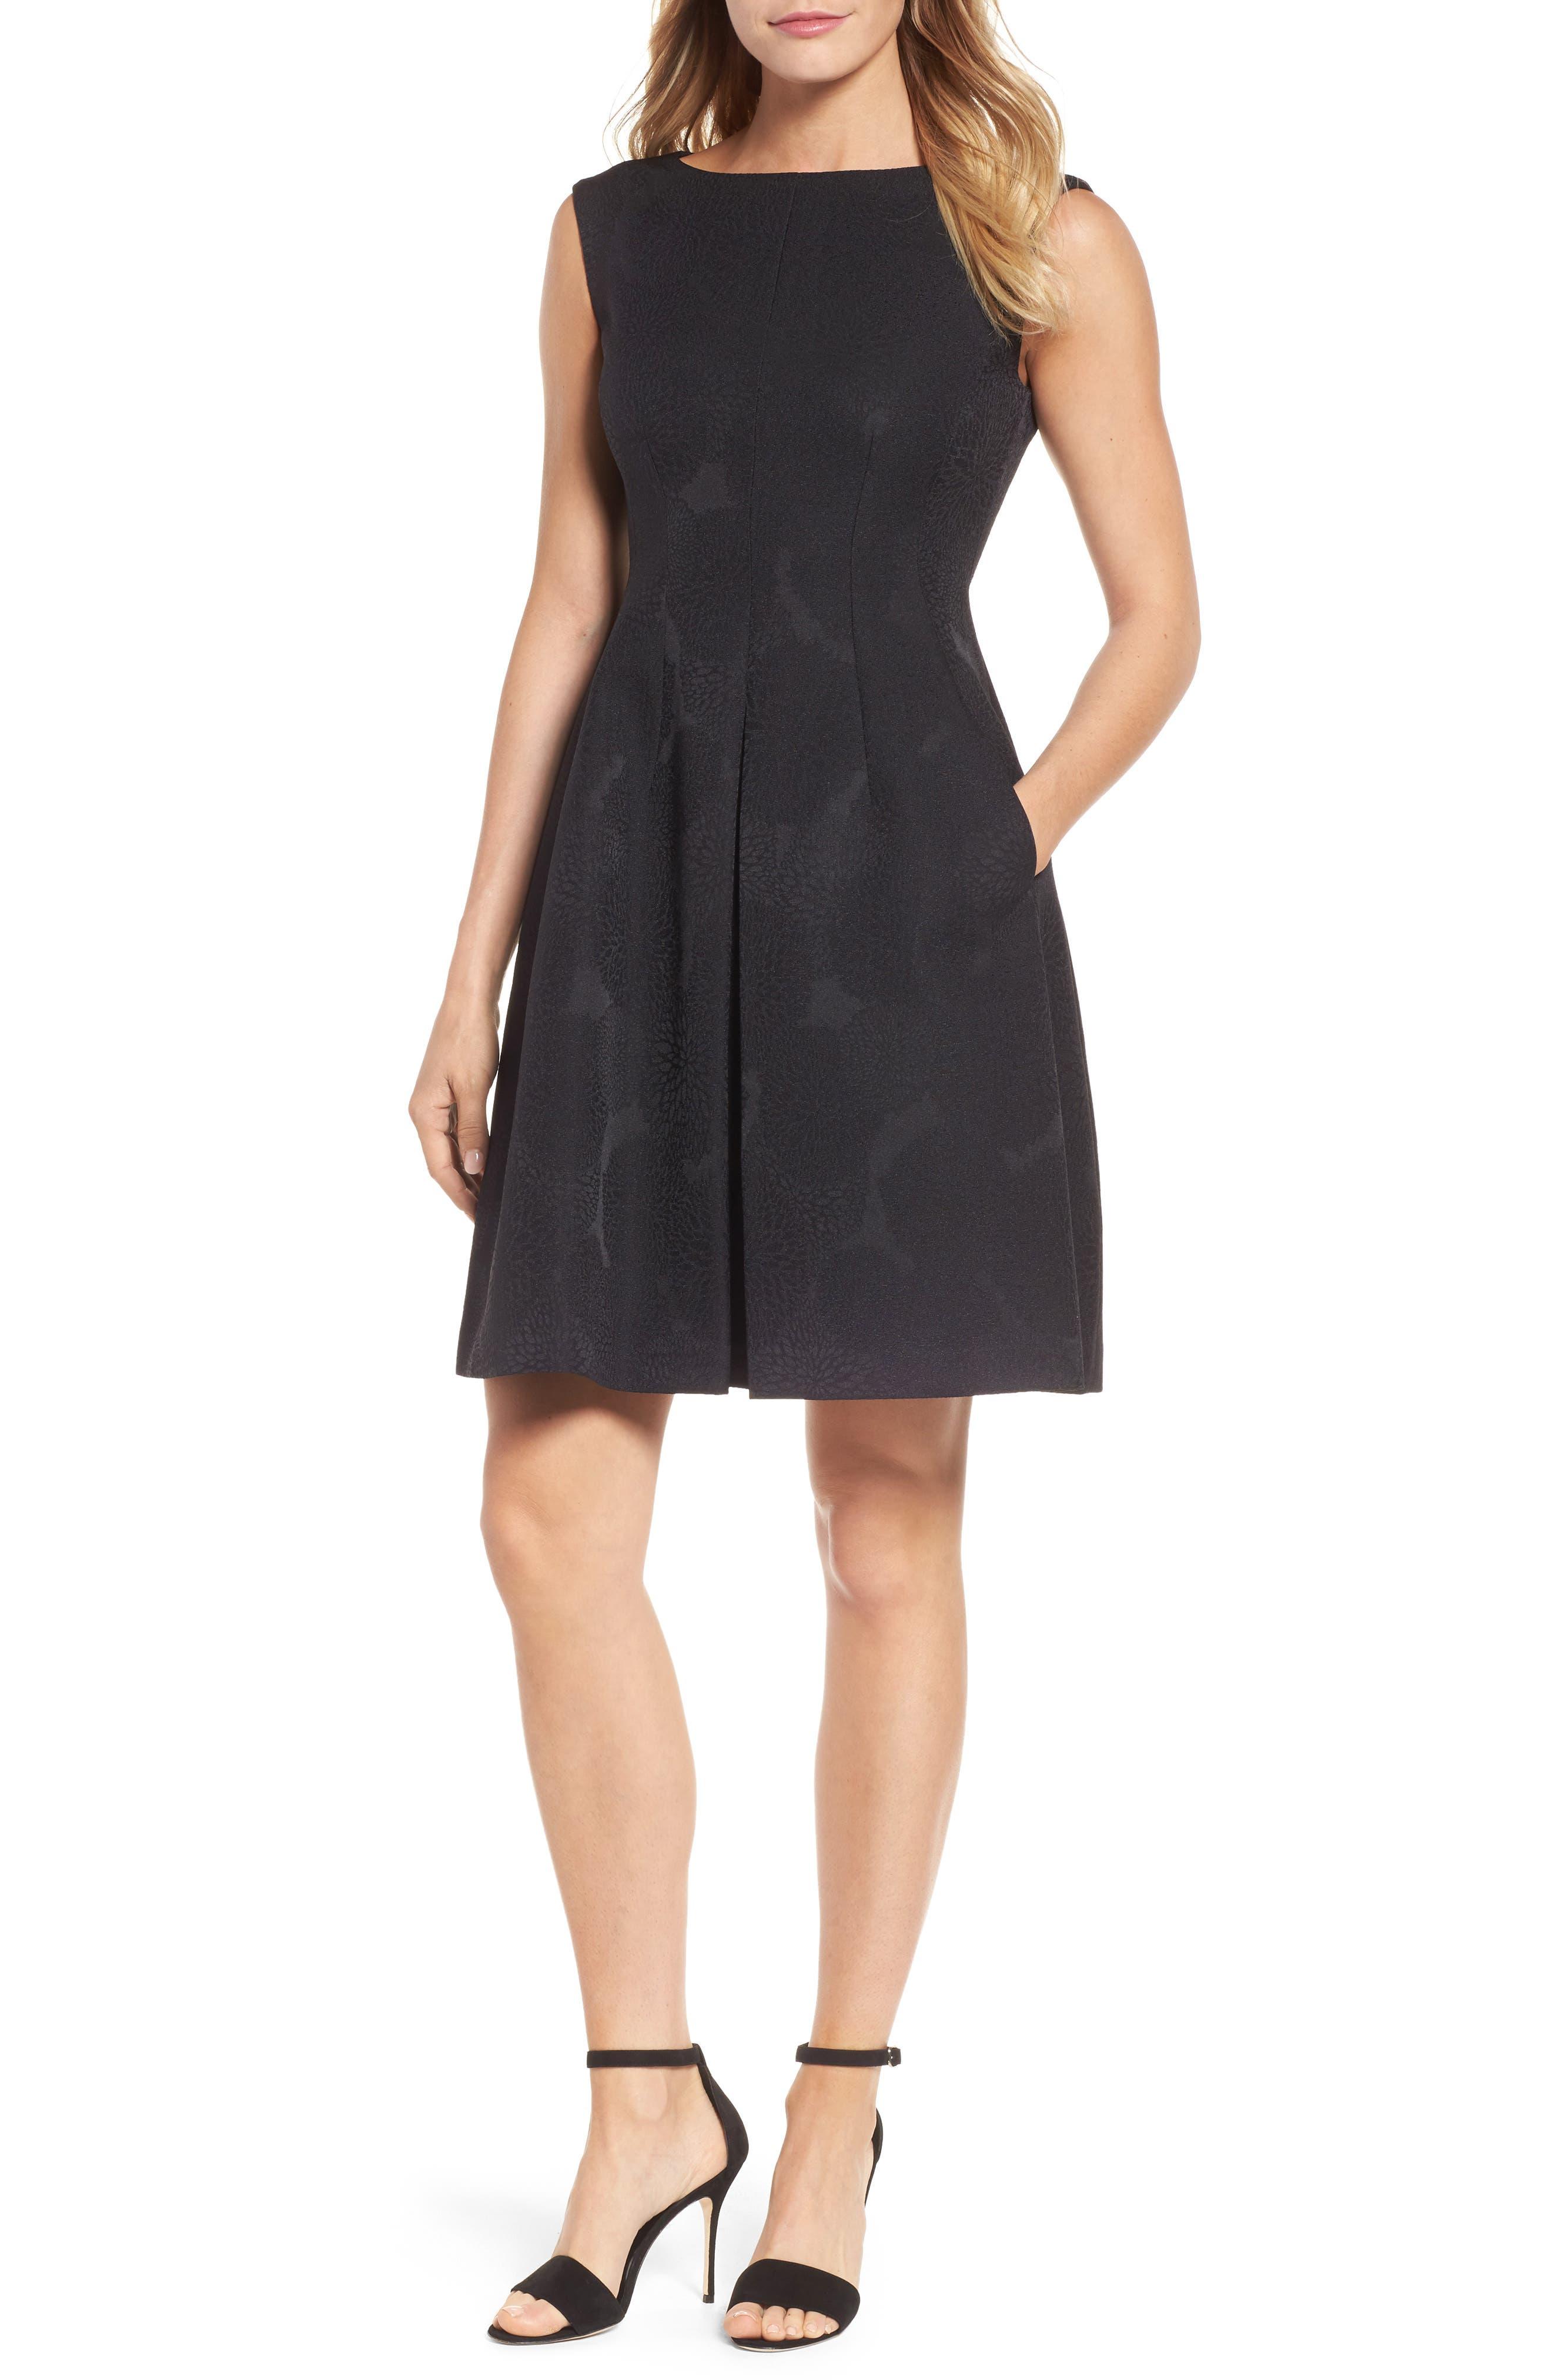 Main Image - Anne Klein Jacqaurd Fit & Flare Dress